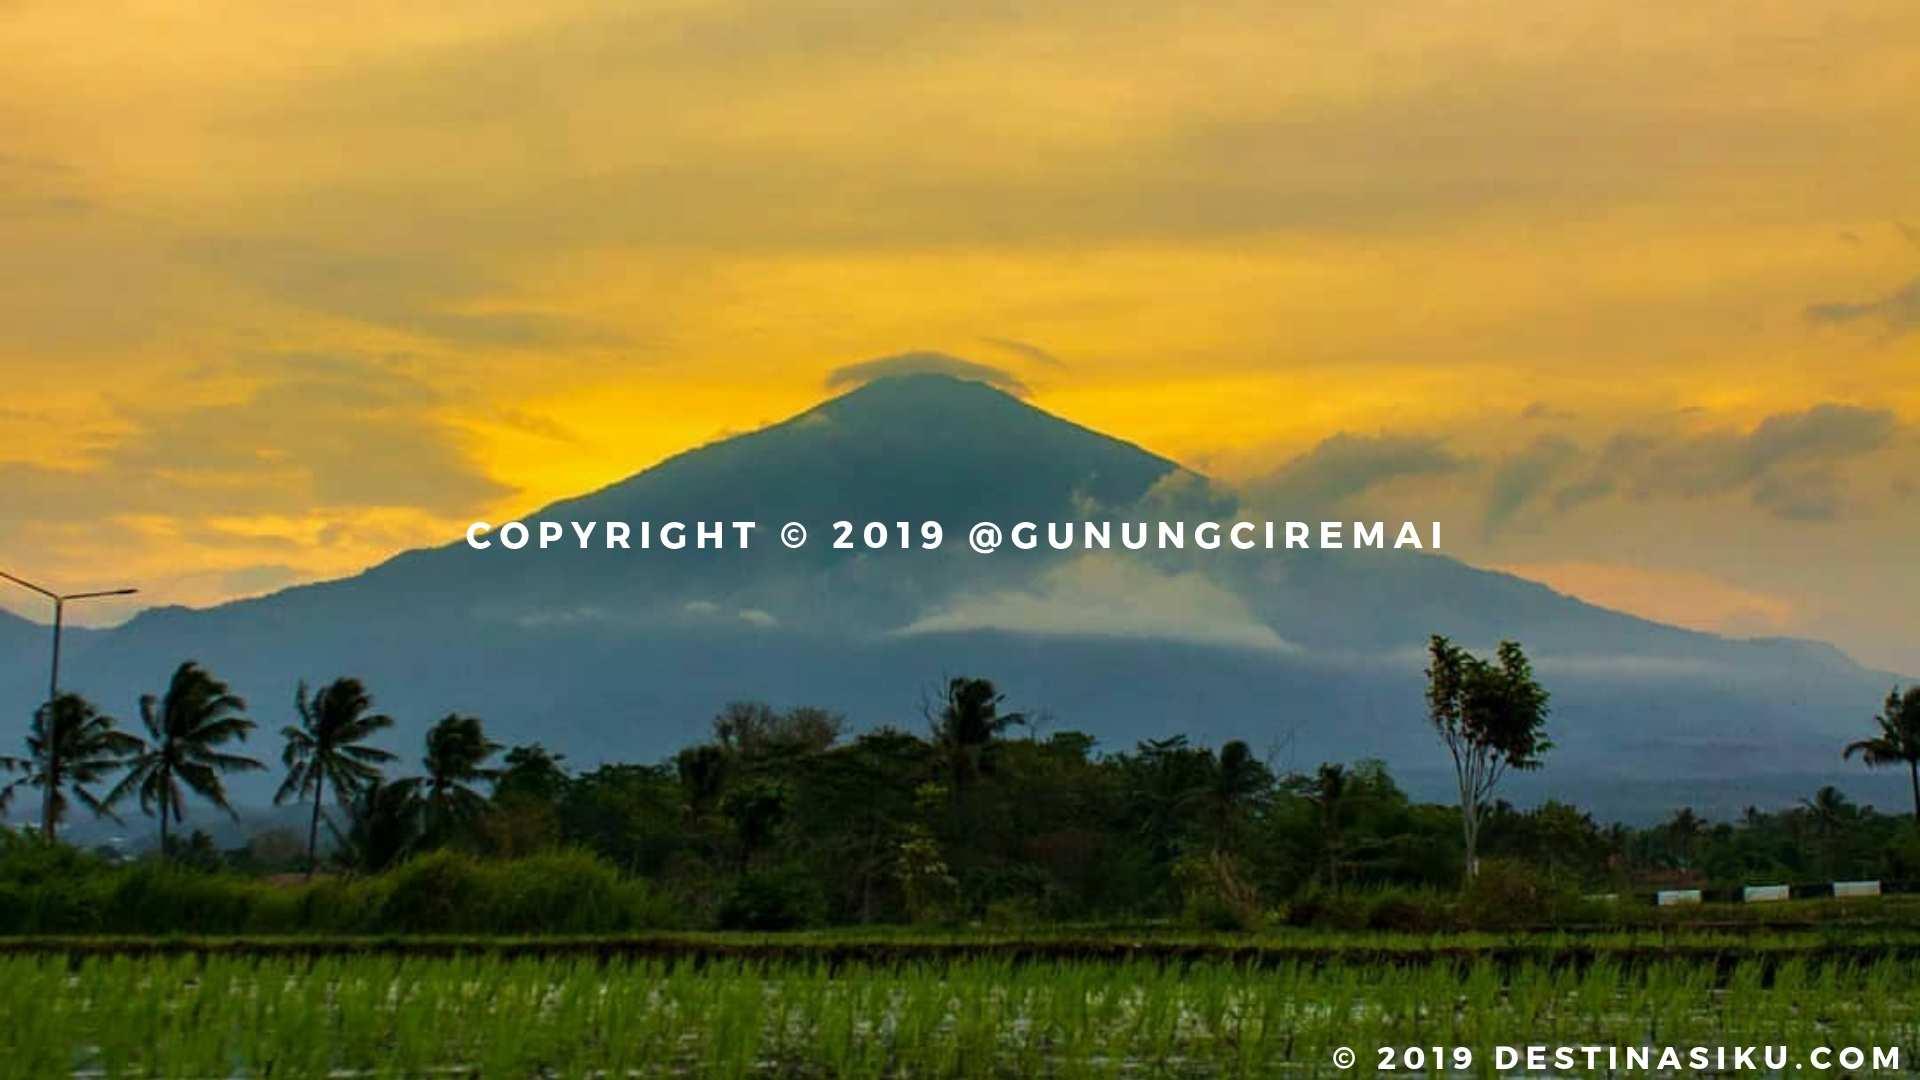 Keindahan Gunung Ciremai